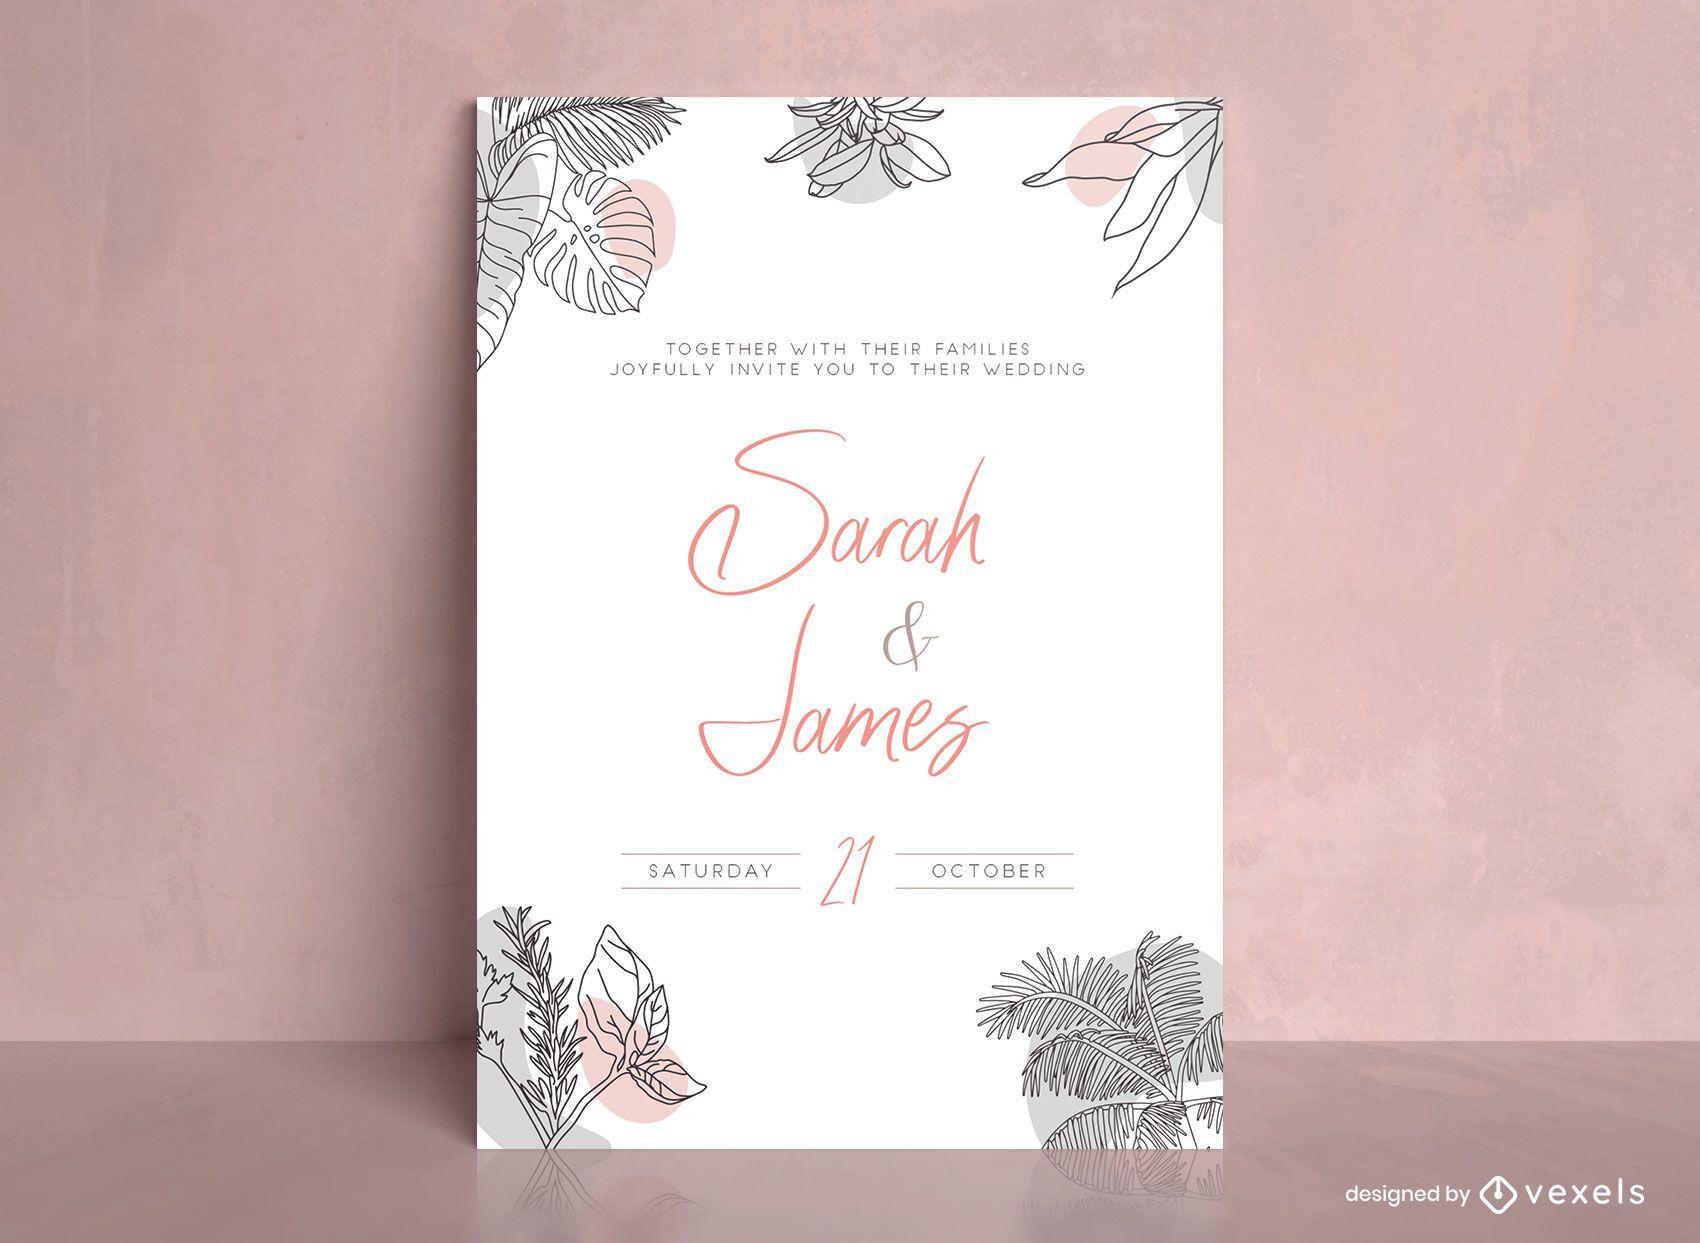 Organic abstract leaves wedding invitation template